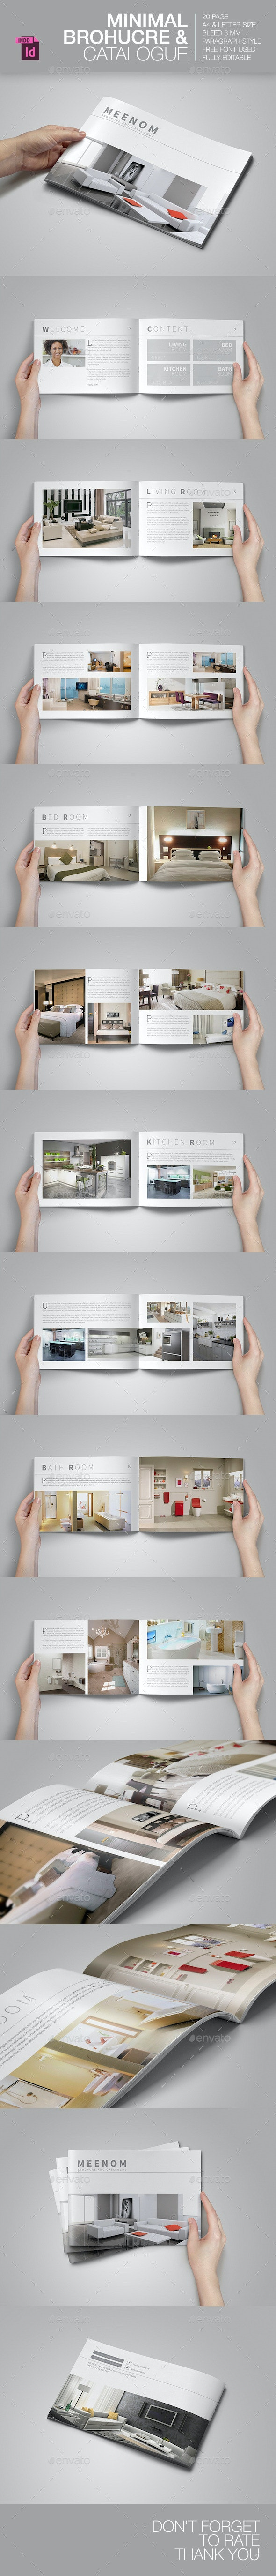 Minimal Brochure & Catalogue - Brochures Print Templates